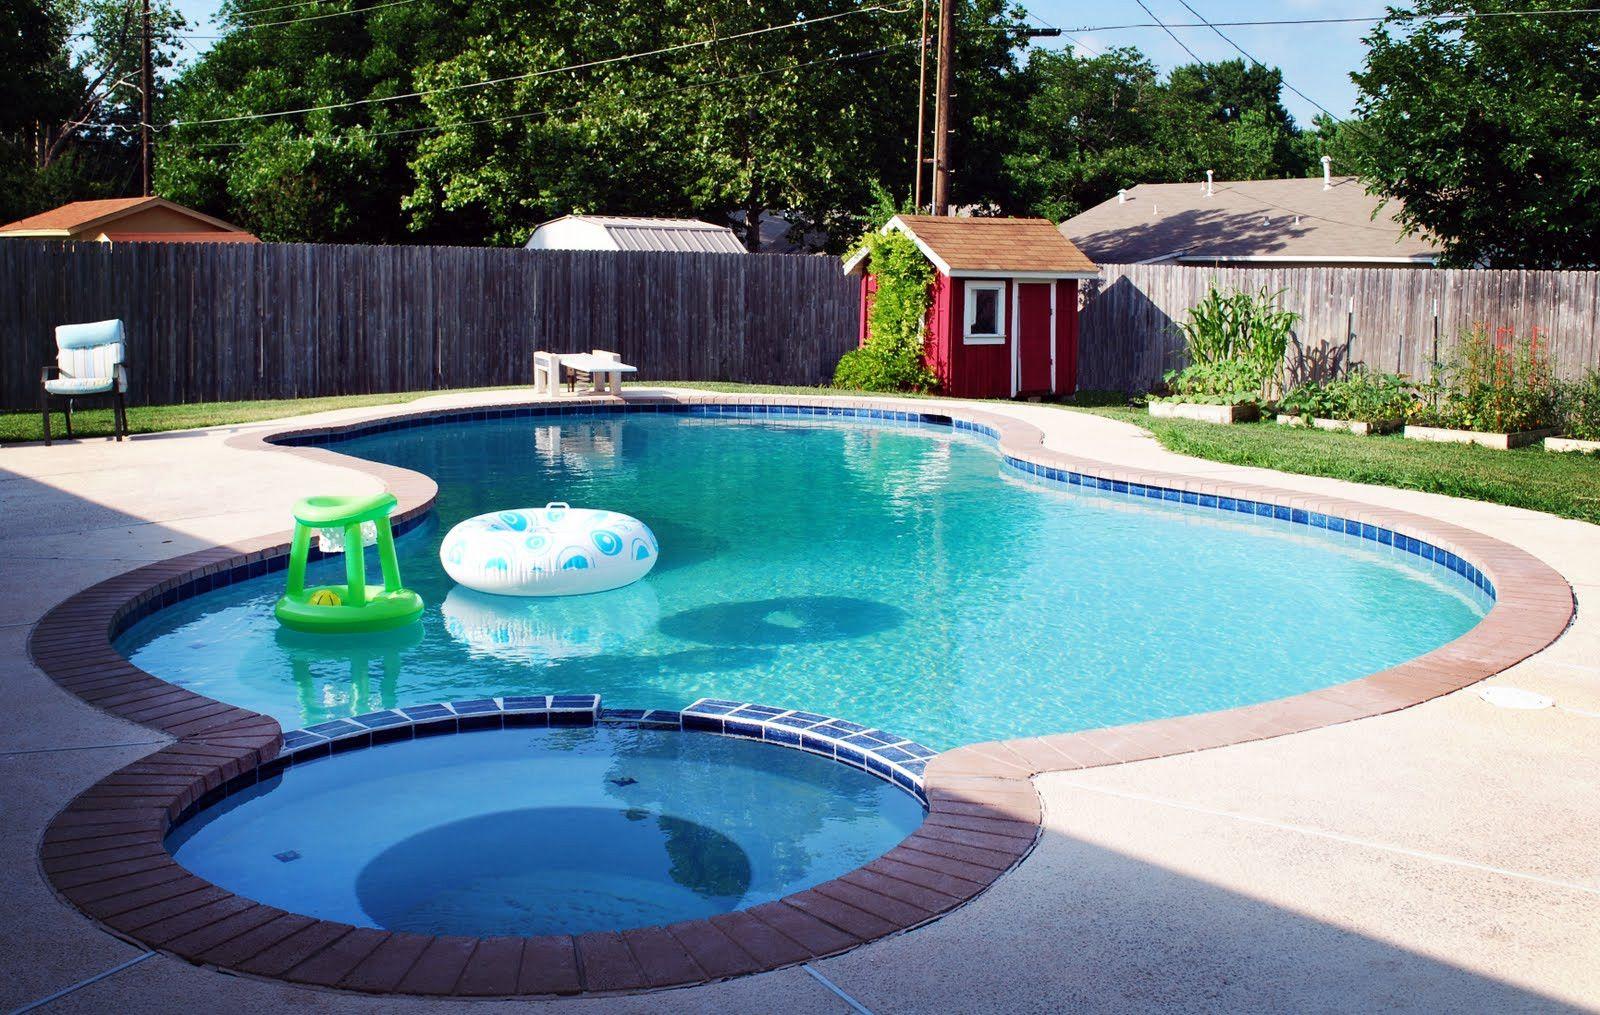 7 Inground Pools For Small Yards Balloondir Small Inground Pool Pools For Small Yards Small Backyard Pools